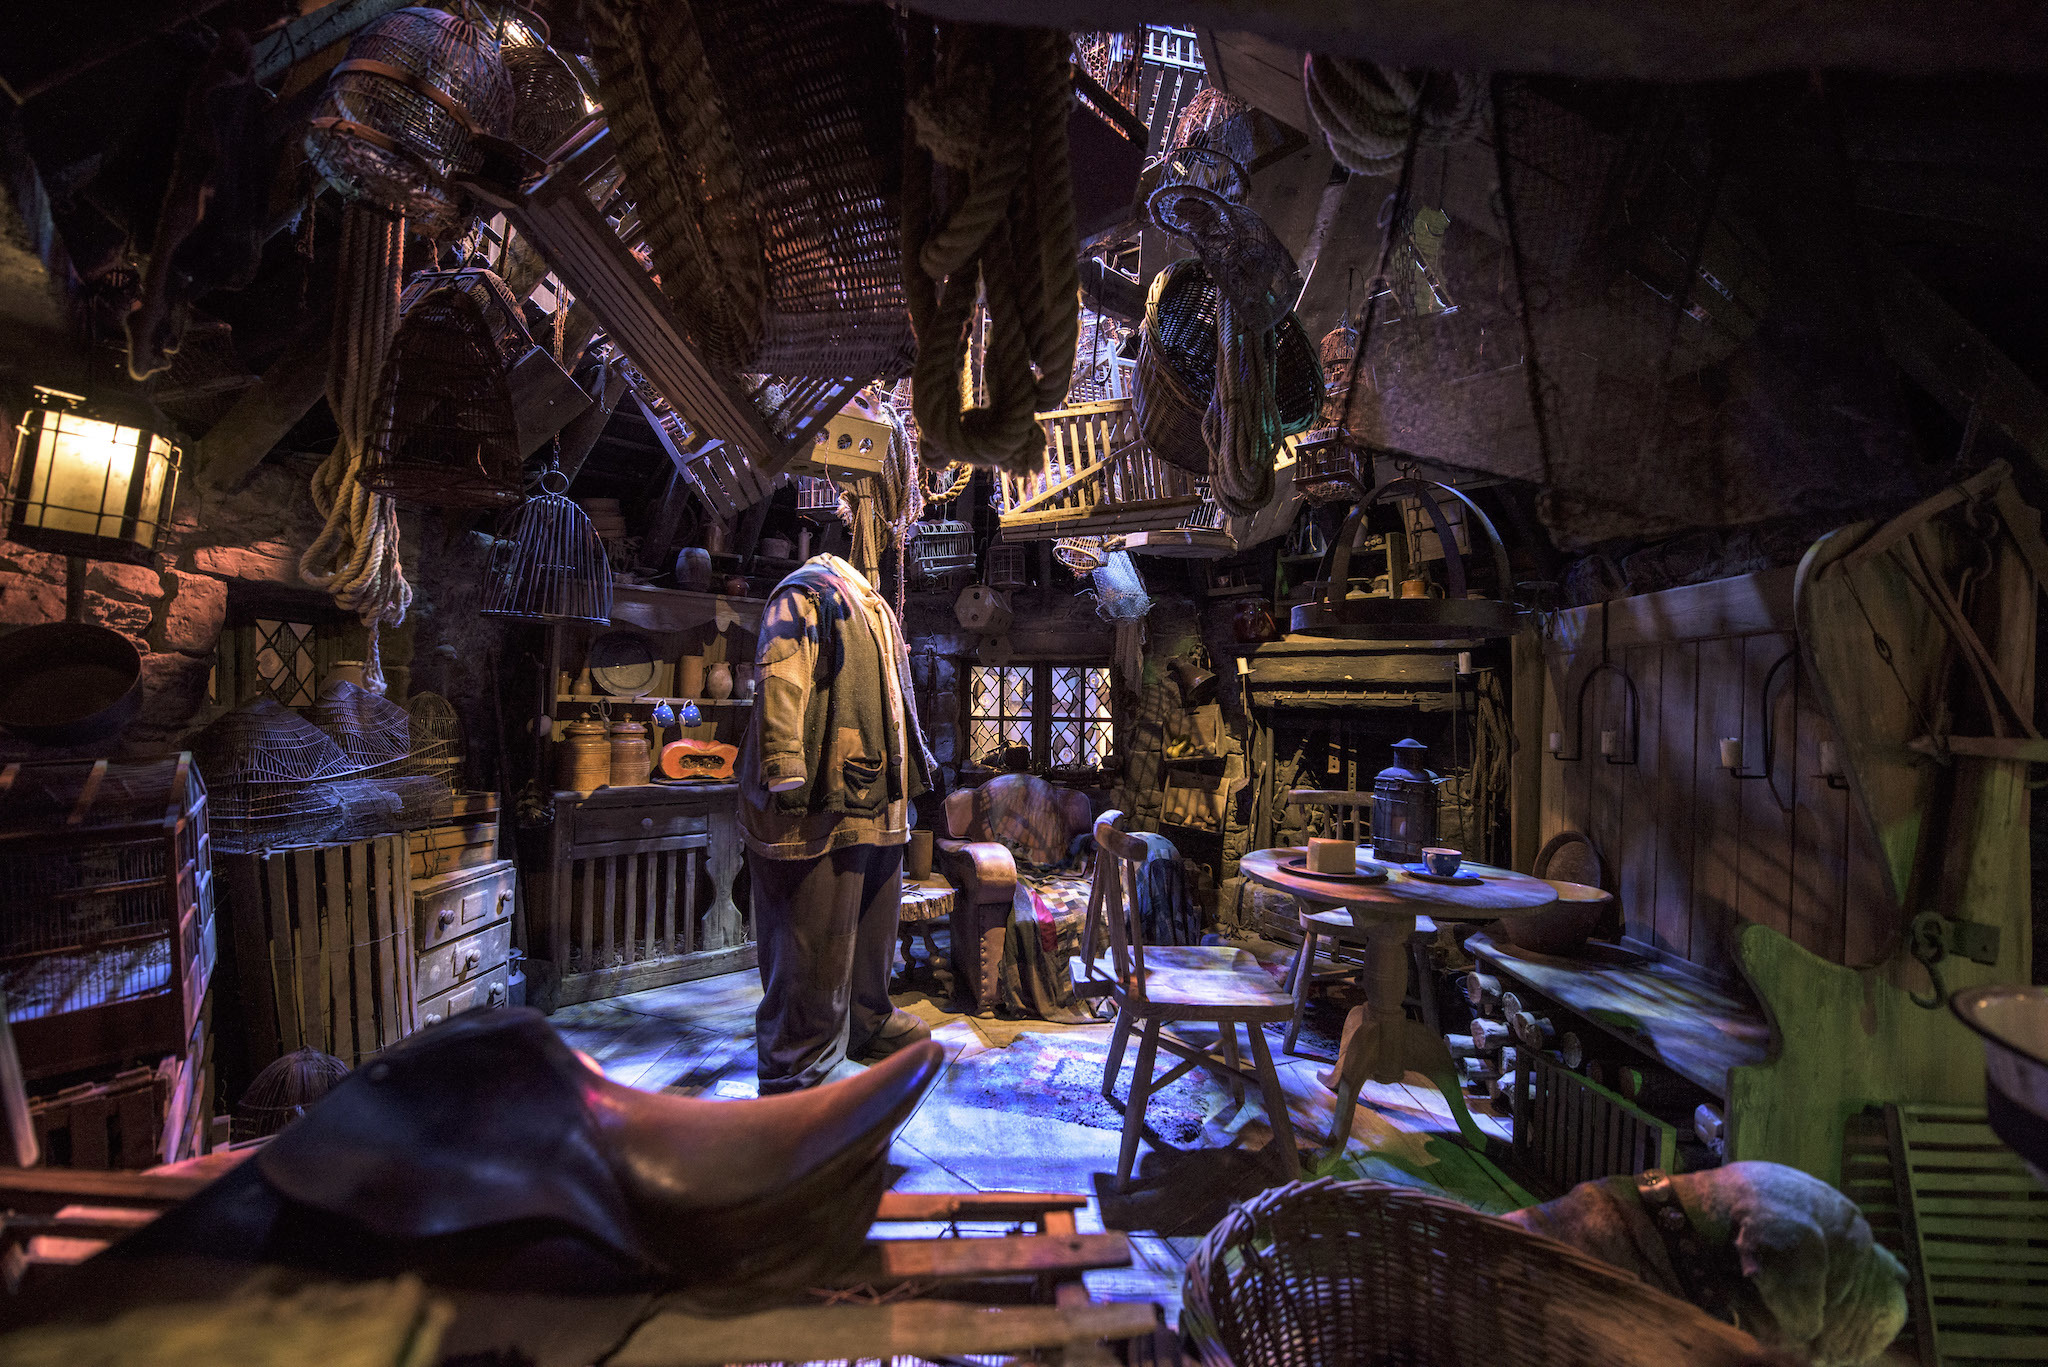 DO NOT REUSE - Harry Potter set at Warner Bros Studio Tour London, Creative Solutions Campaign